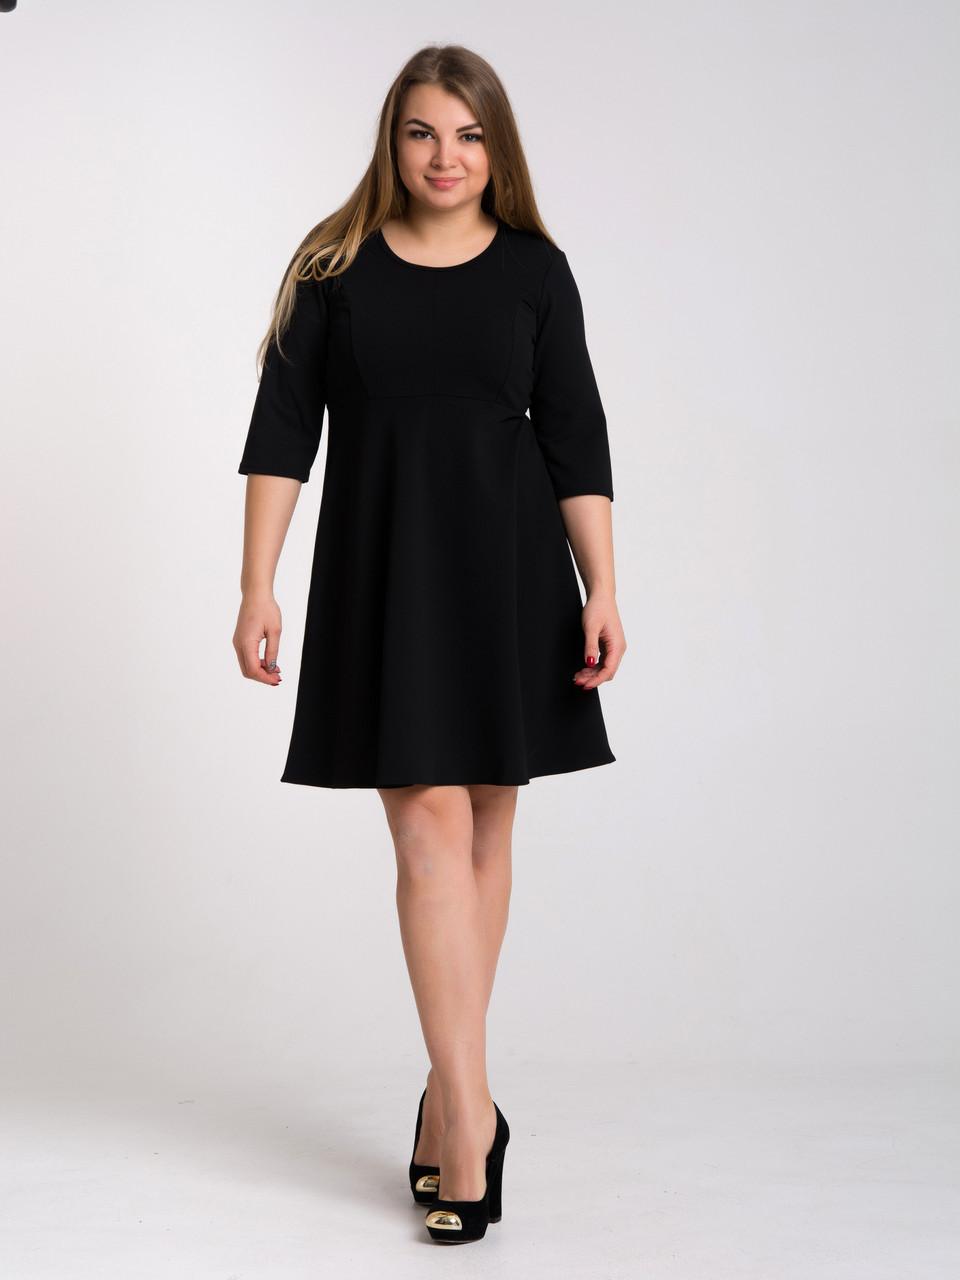 e1eda501f5a19e2 Базовое женское платье 50р от интернет магазина